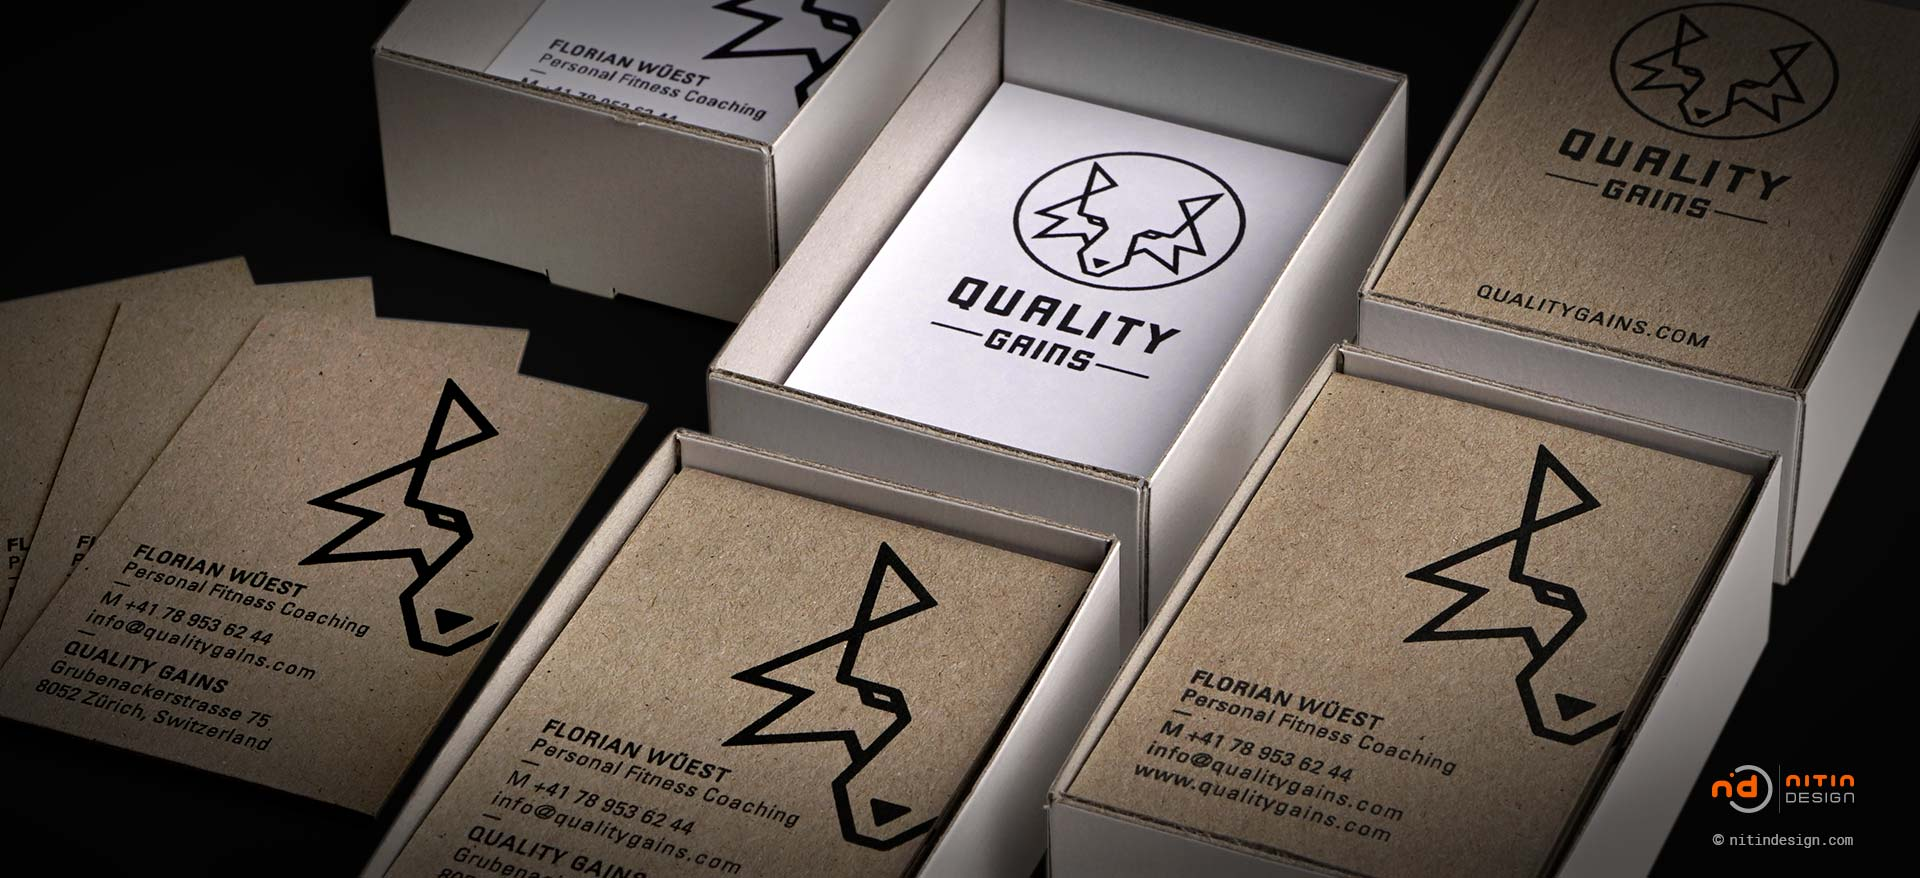 Quality-Gains-Nitin-Design